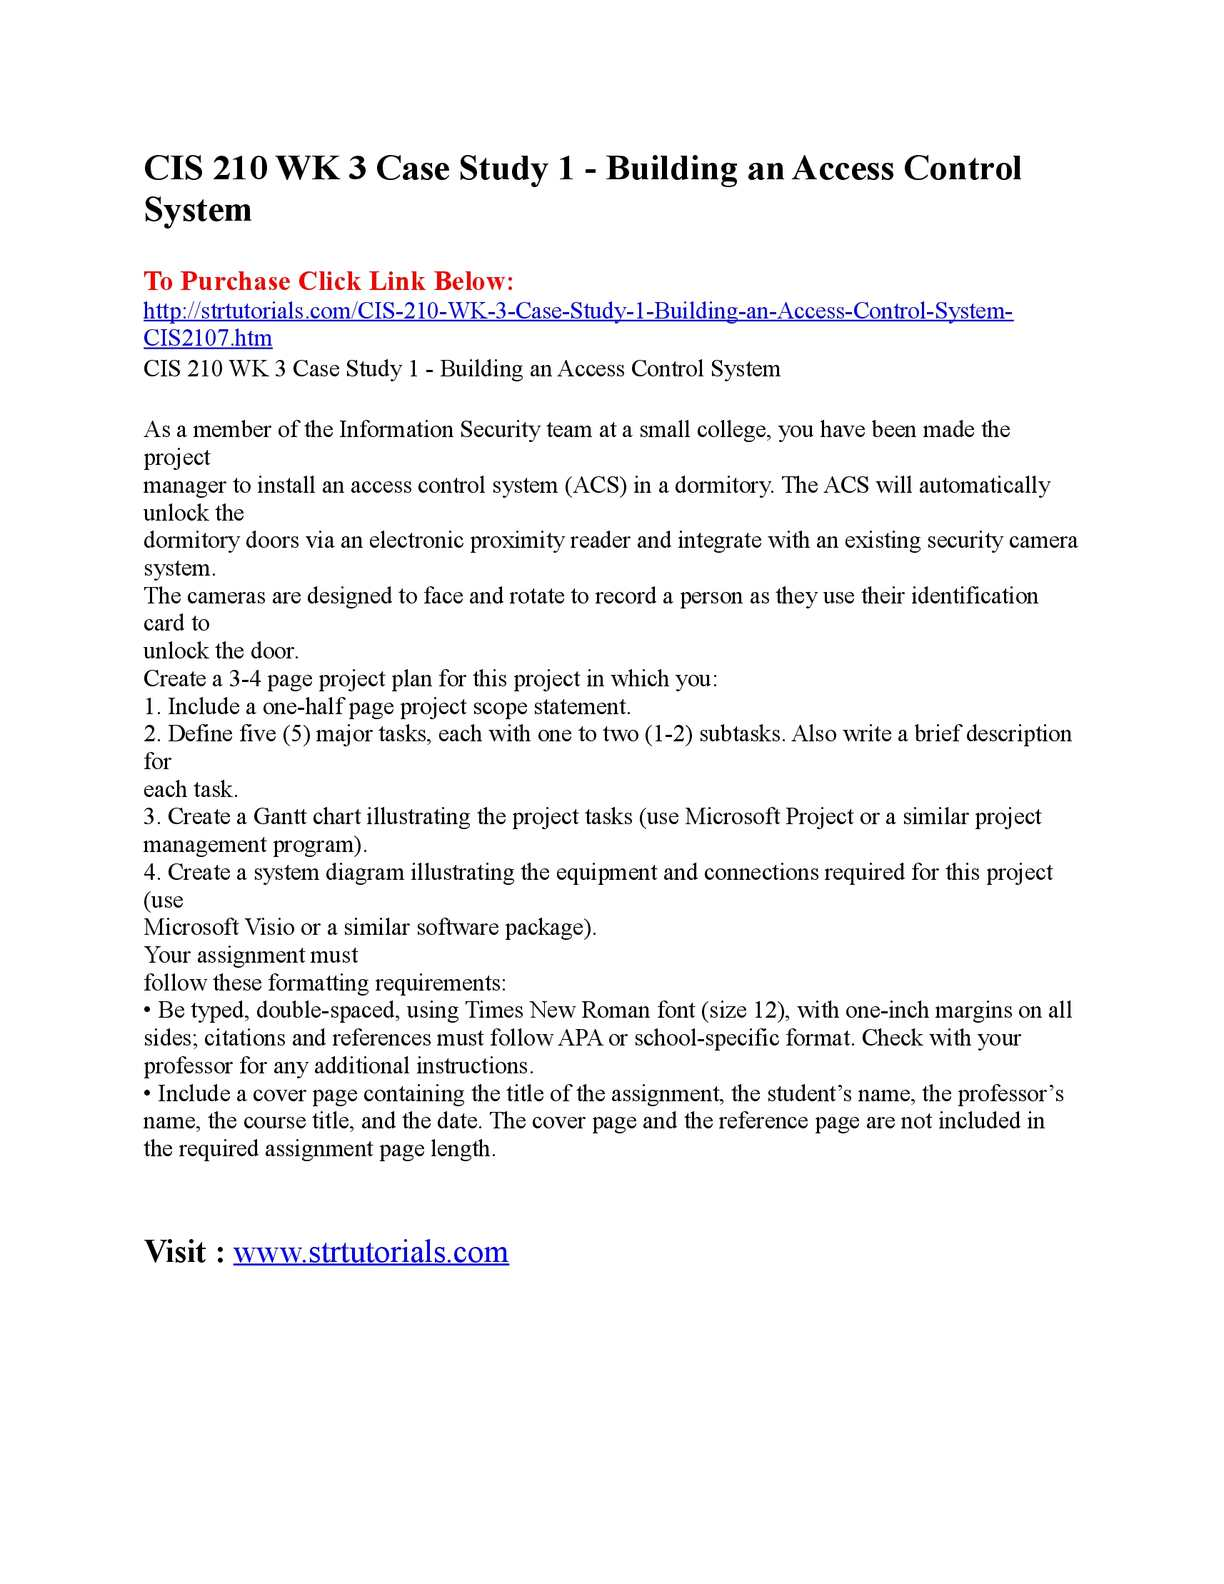 Writing Academic Papers - Kutztown